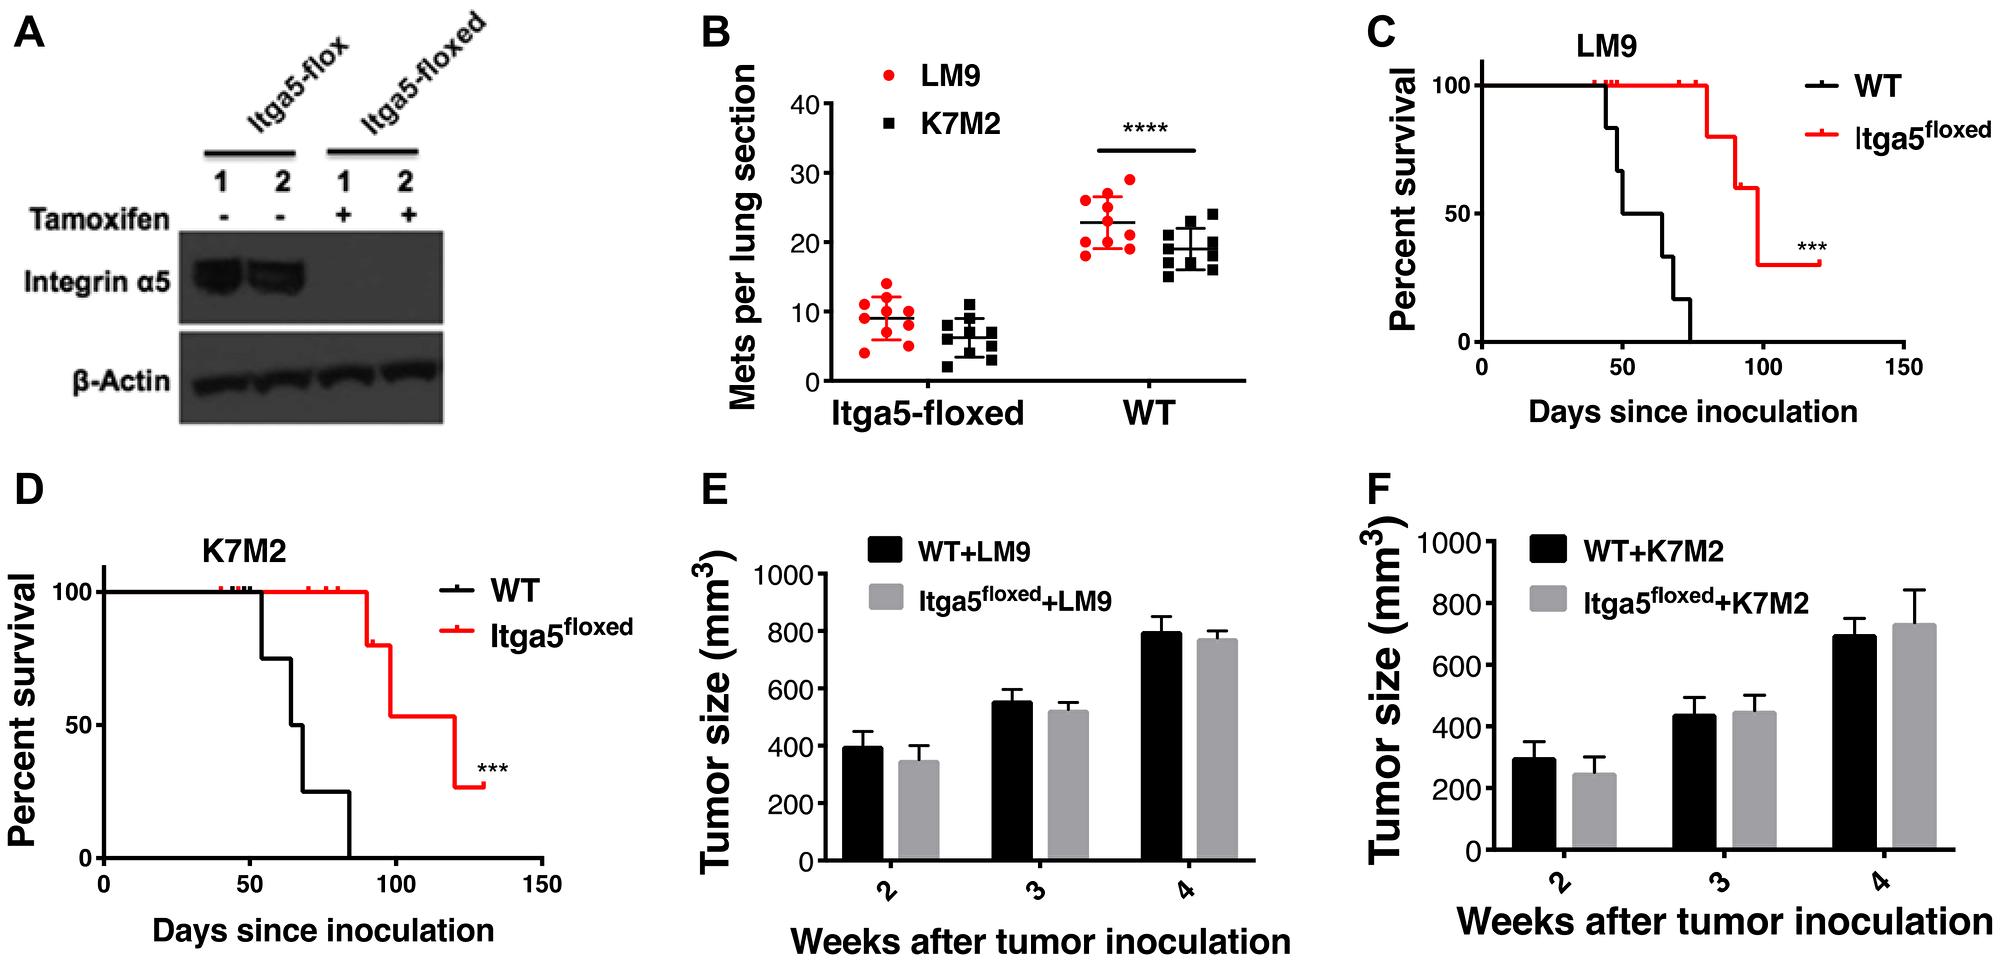 Integrin α5β1 deficiency in alveolar type II (AT-II) diminishes establishment of osteosarcoma lung metastasis.